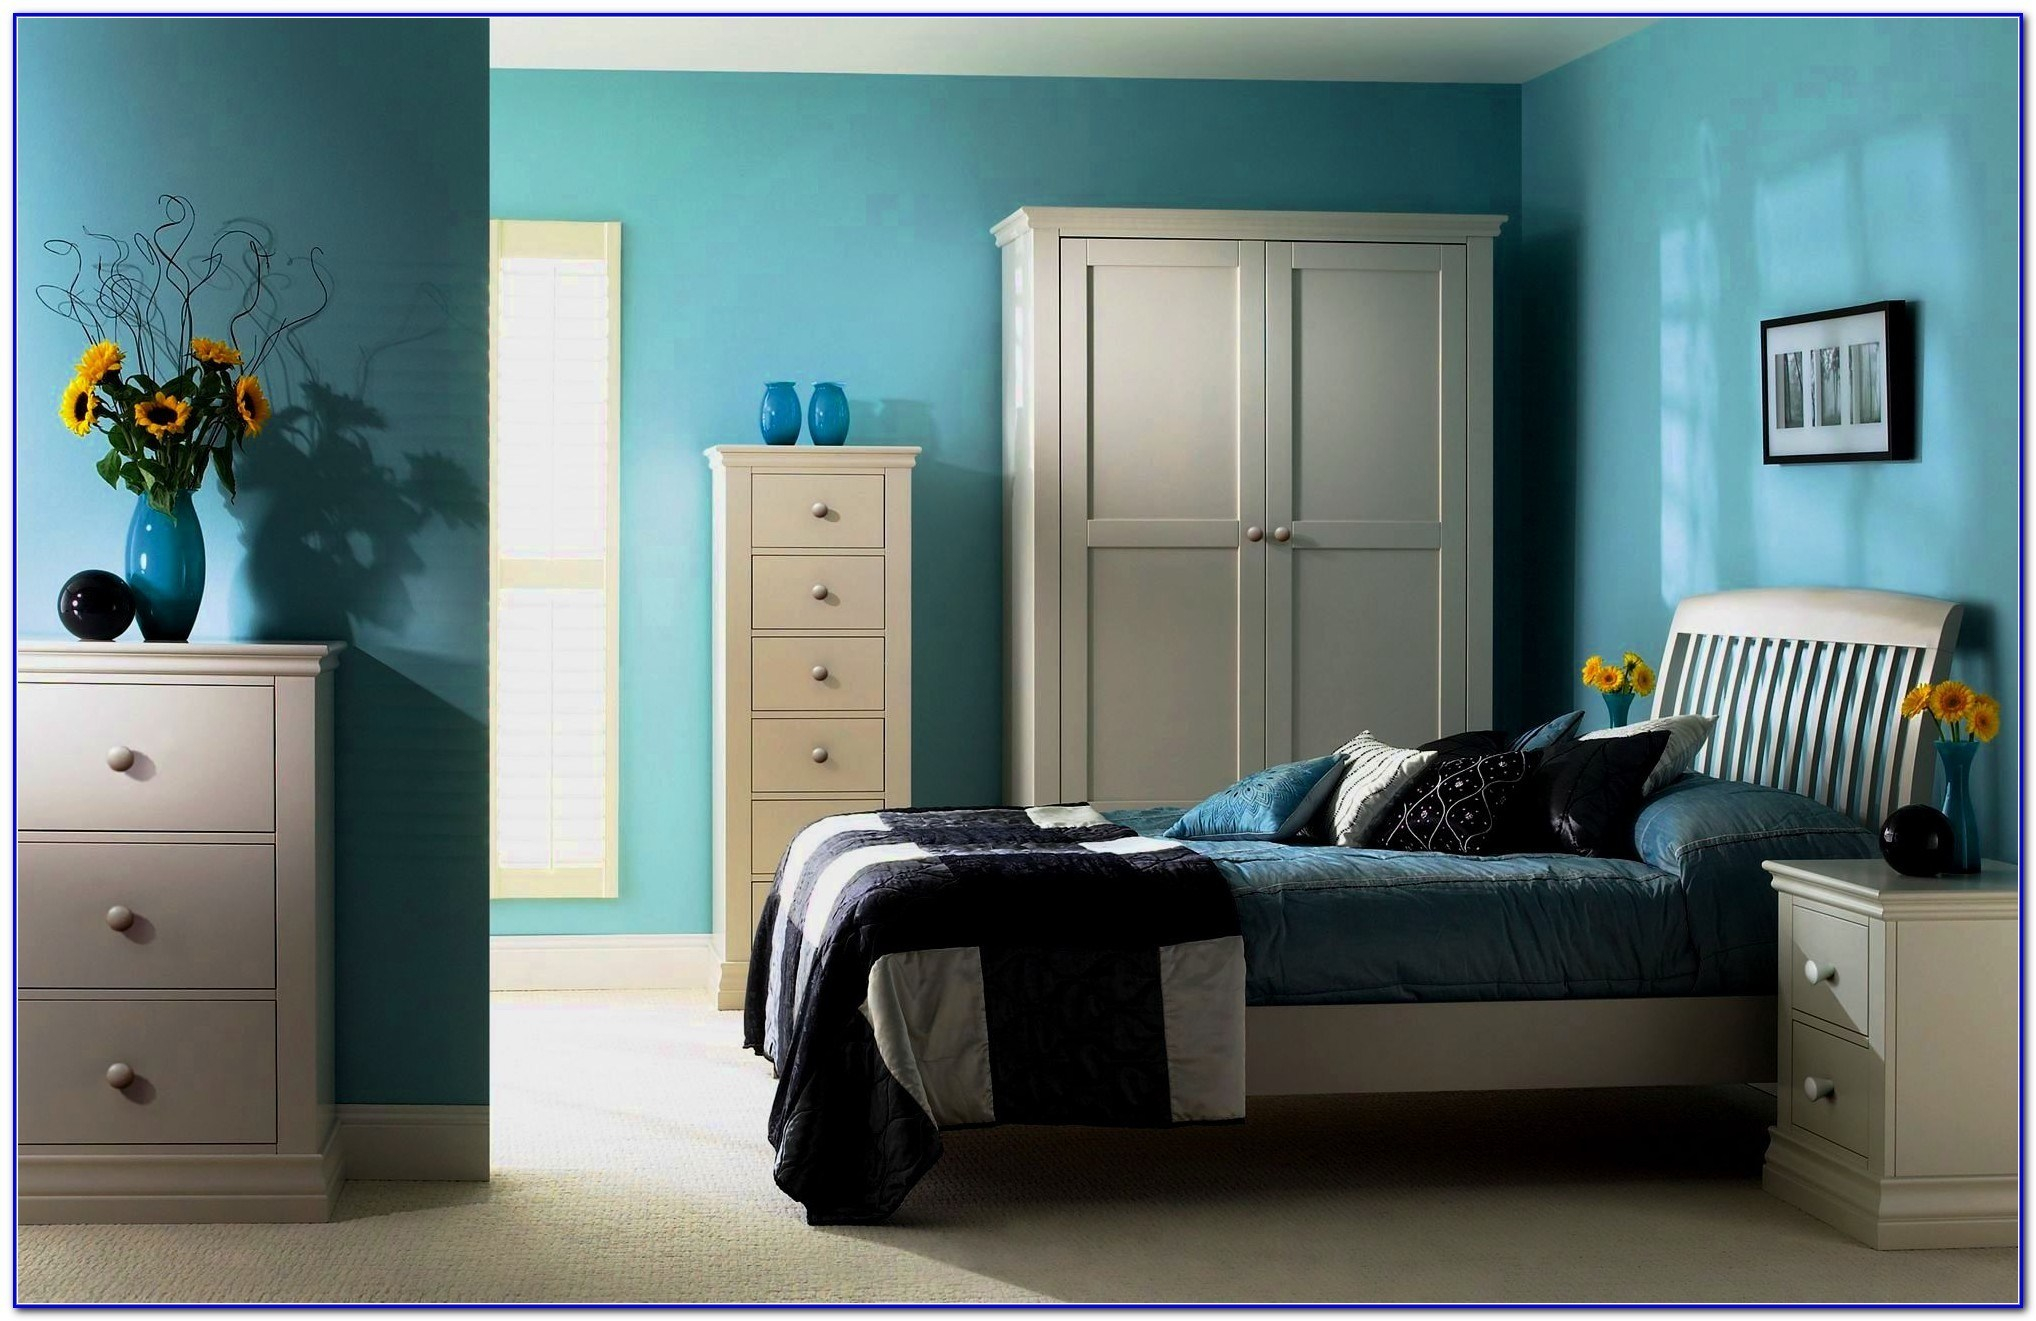 Best Color For Bedroom Walls Feng Shui • Kitchen Cabinet Ideas